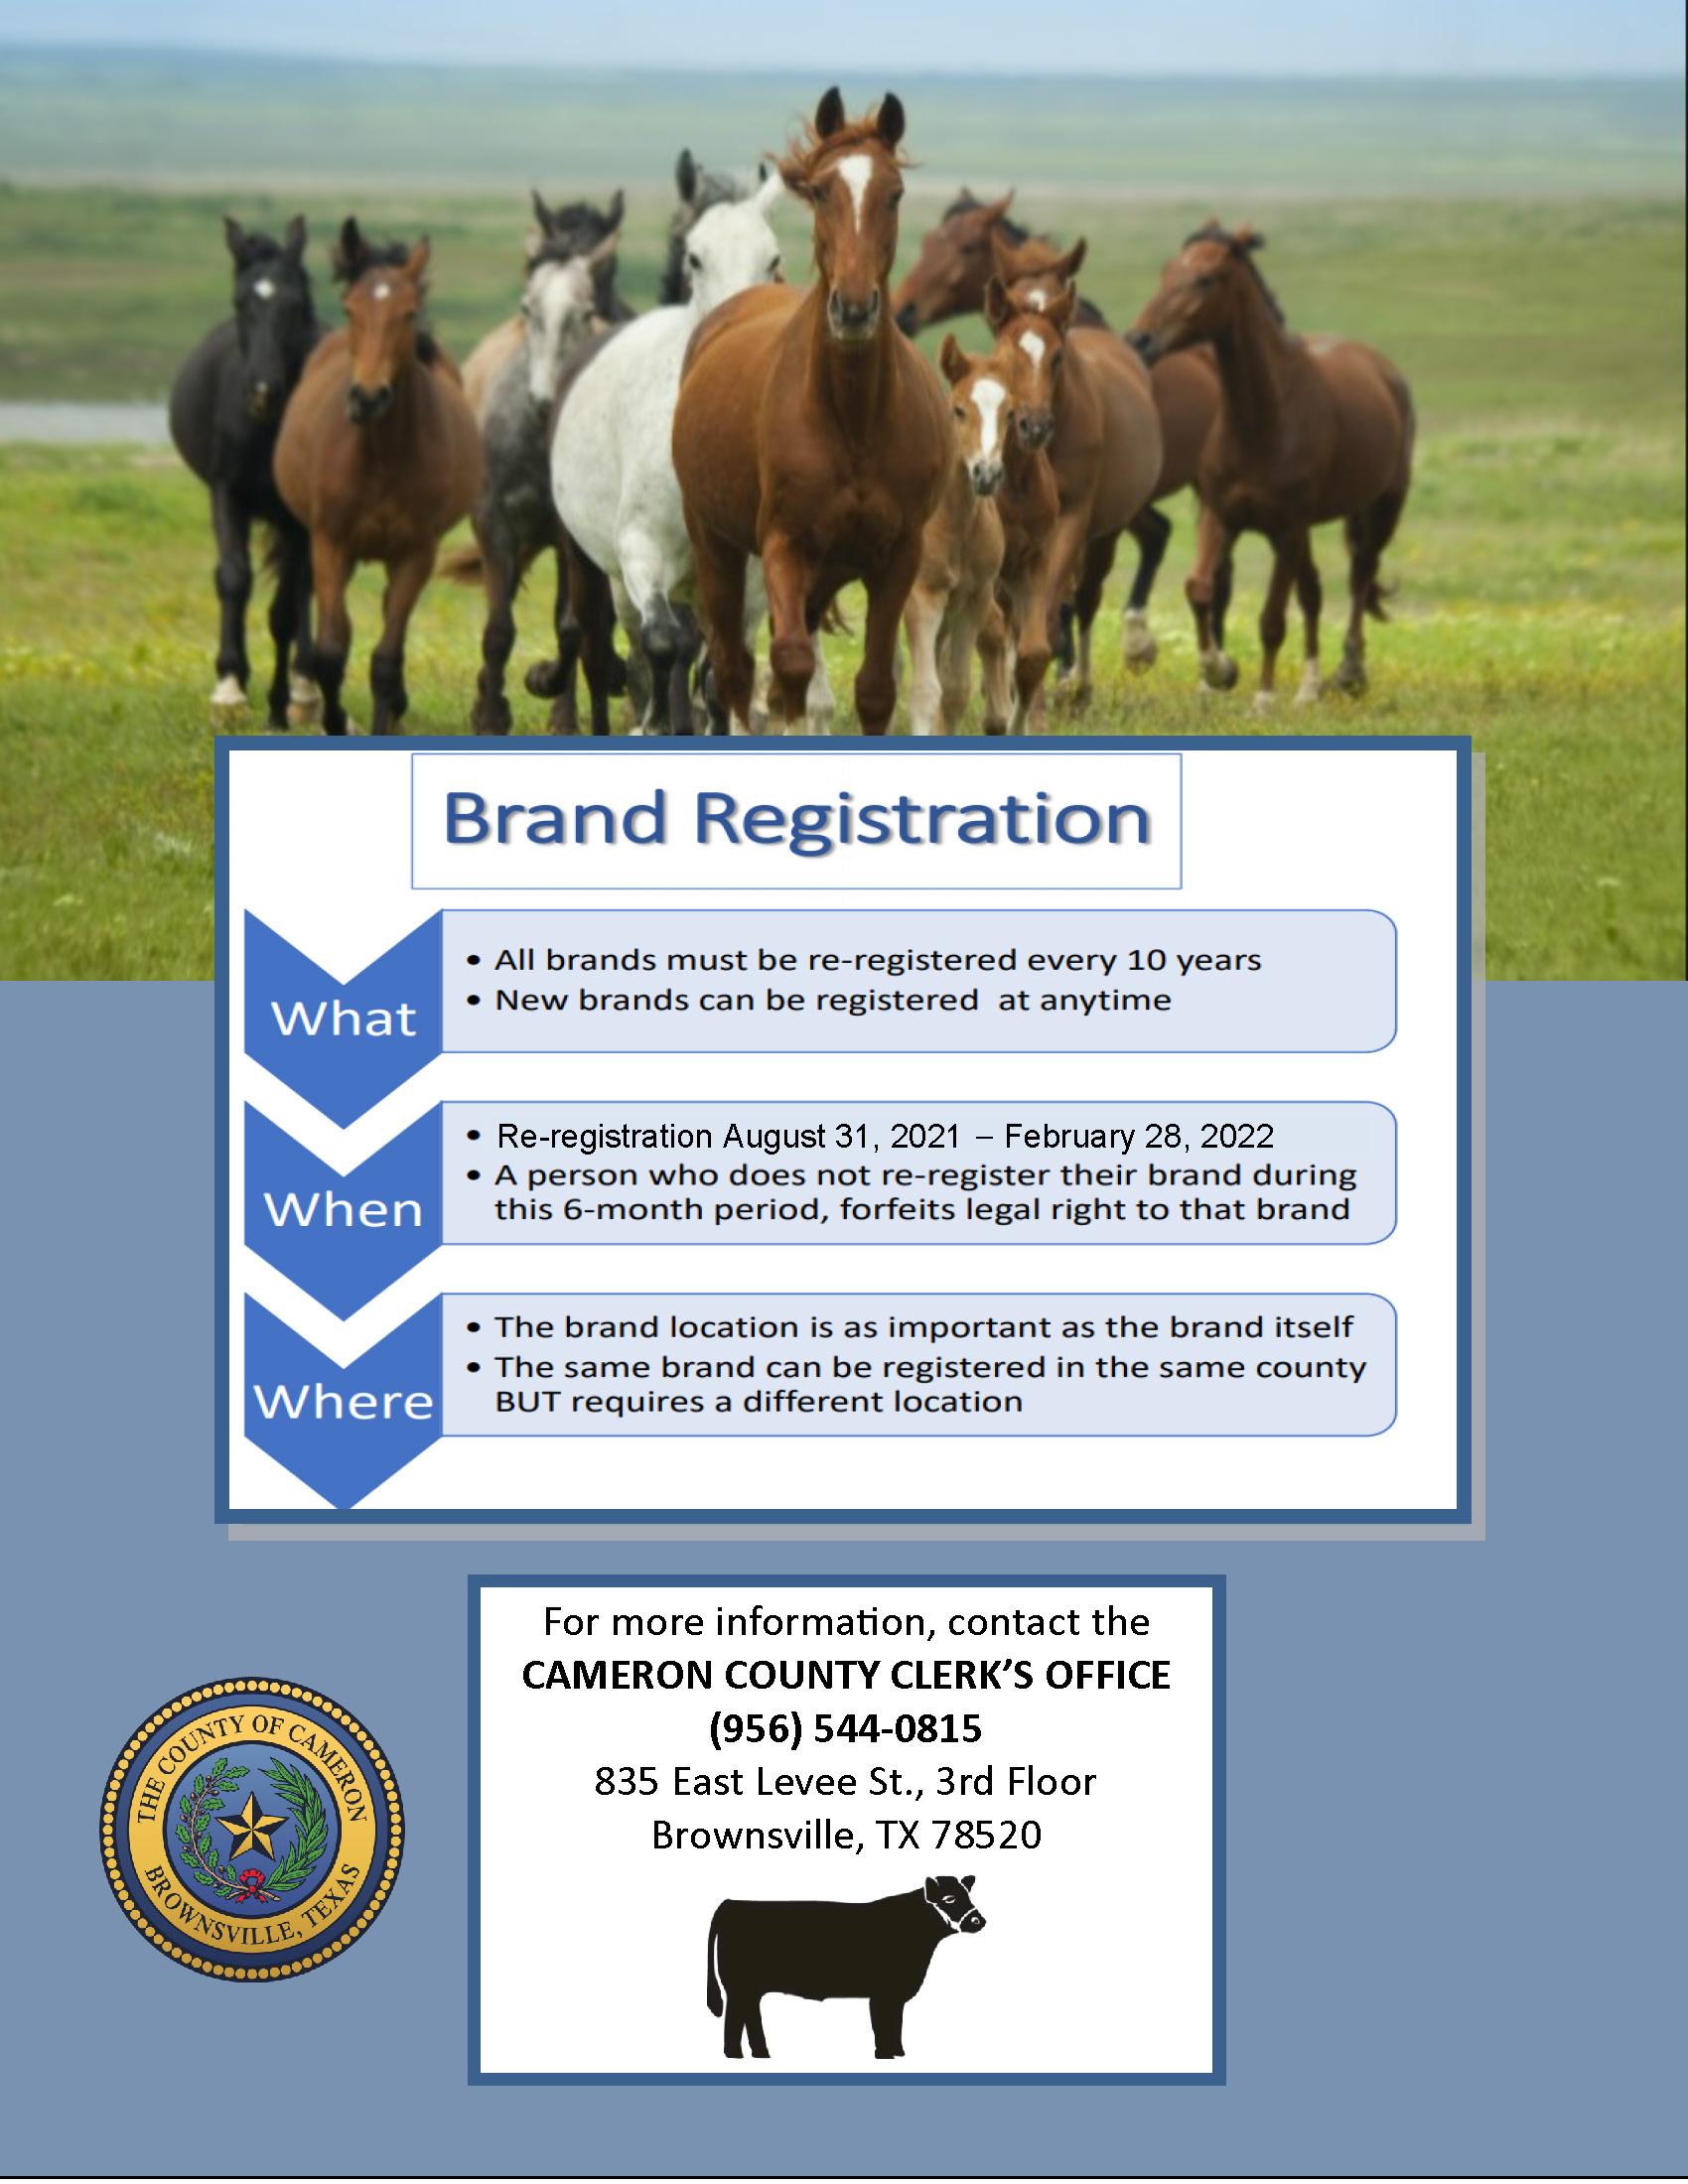 Brand Registration Cameron County Clerk